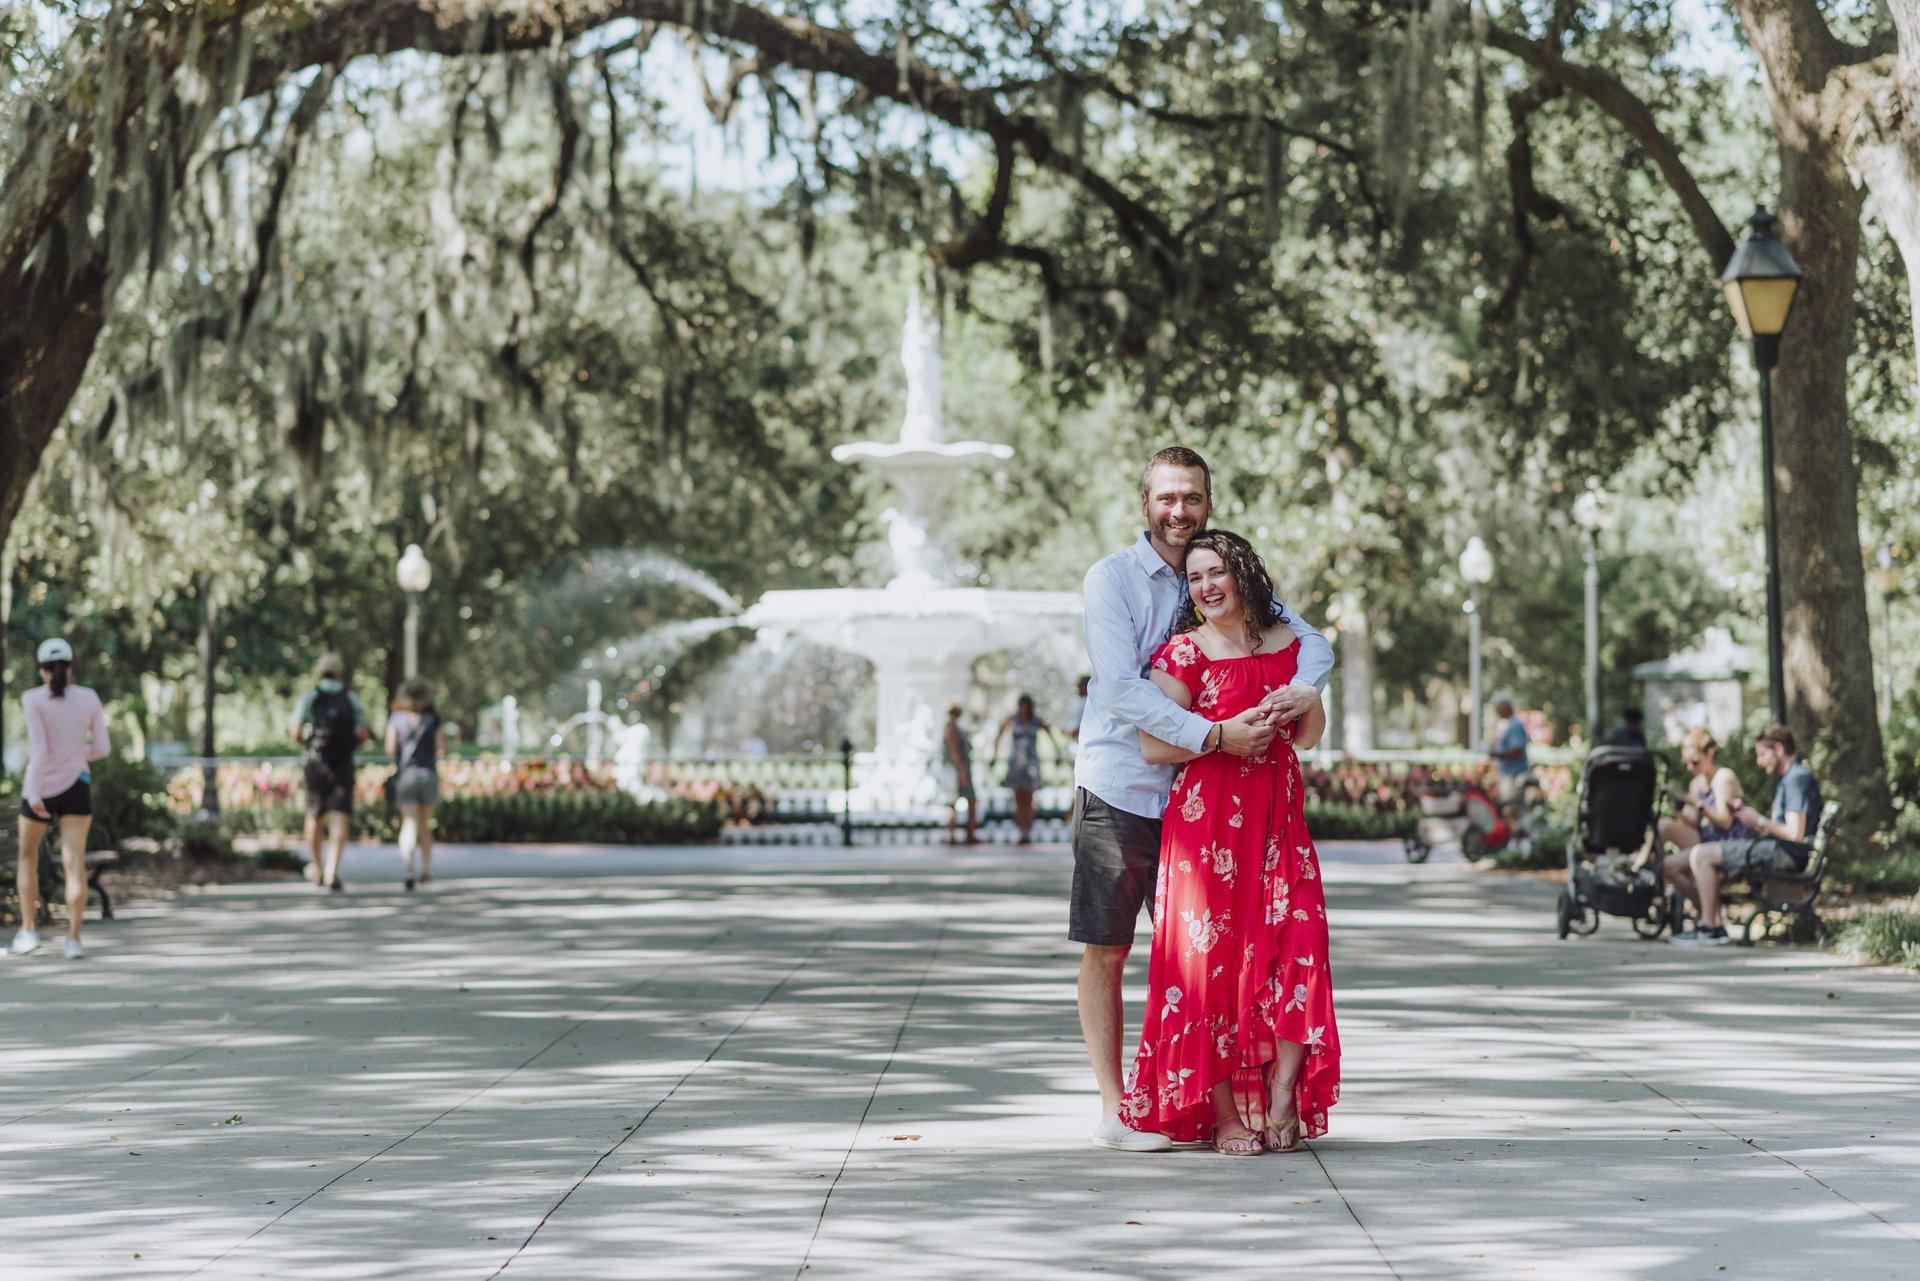 Savannah-United States-travel-story-Flytographer-20